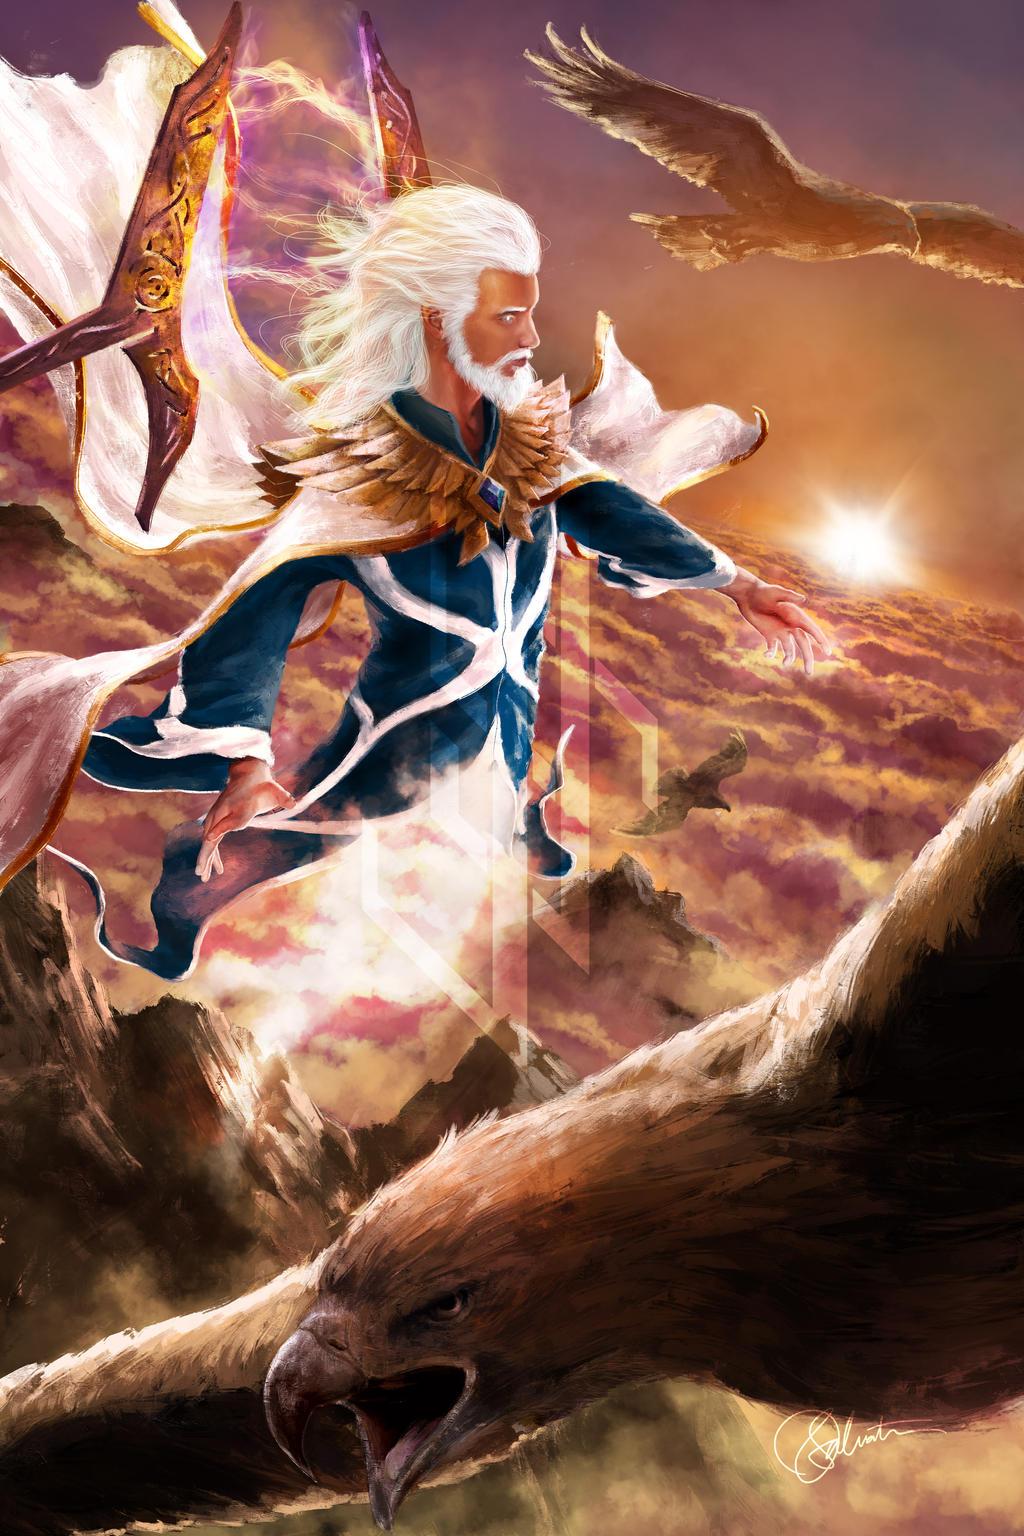 Manwe, King of Arda by skinnyuann on DeviantArt Manwe